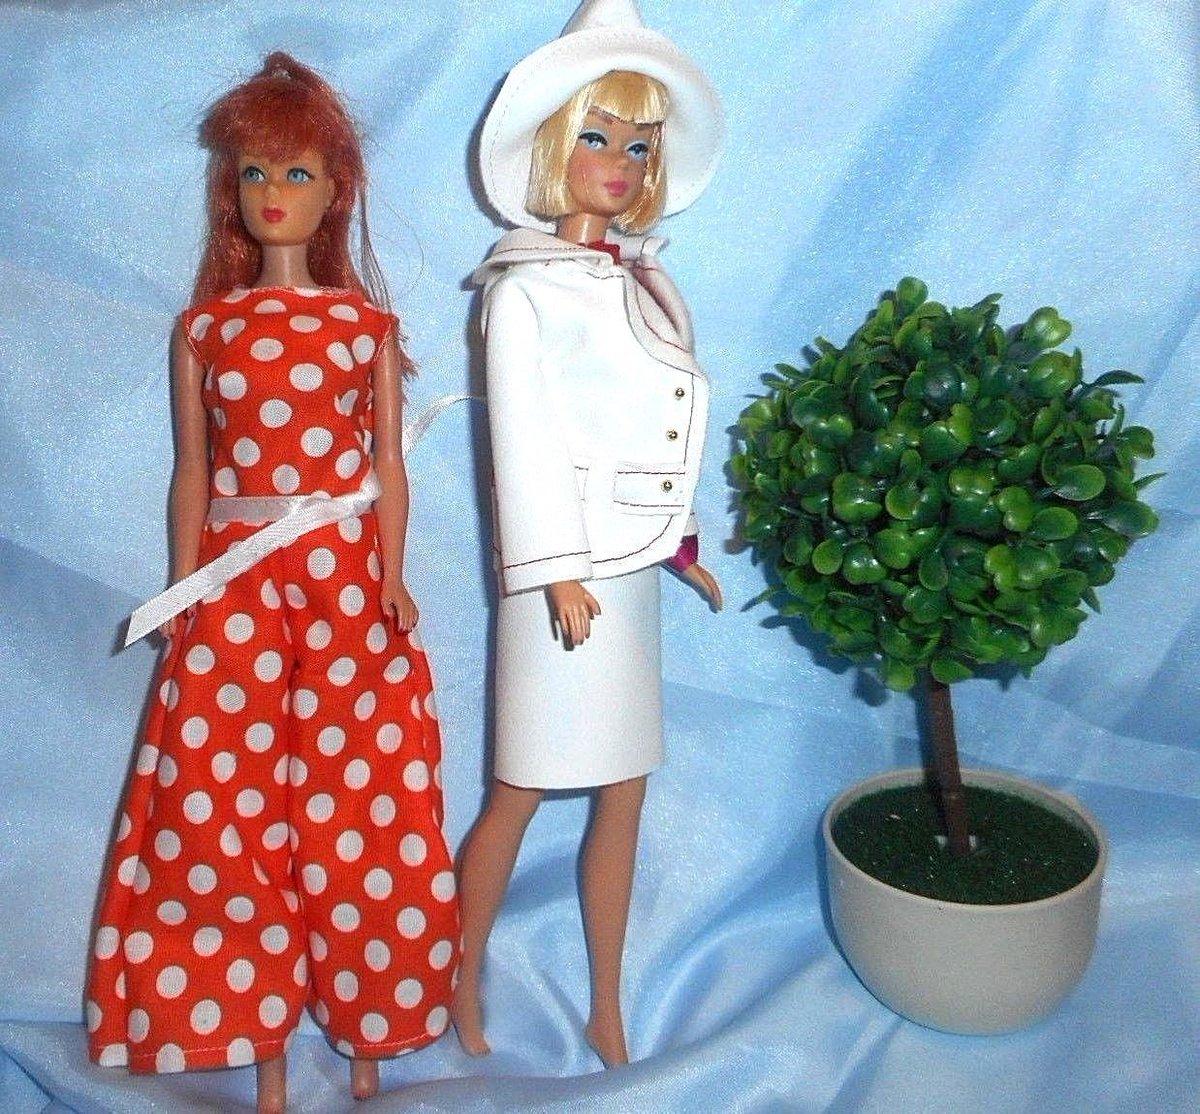 OOAK Barbie Color Magic inspired Mod Flower dress lot of 3 dress set 9 pieces